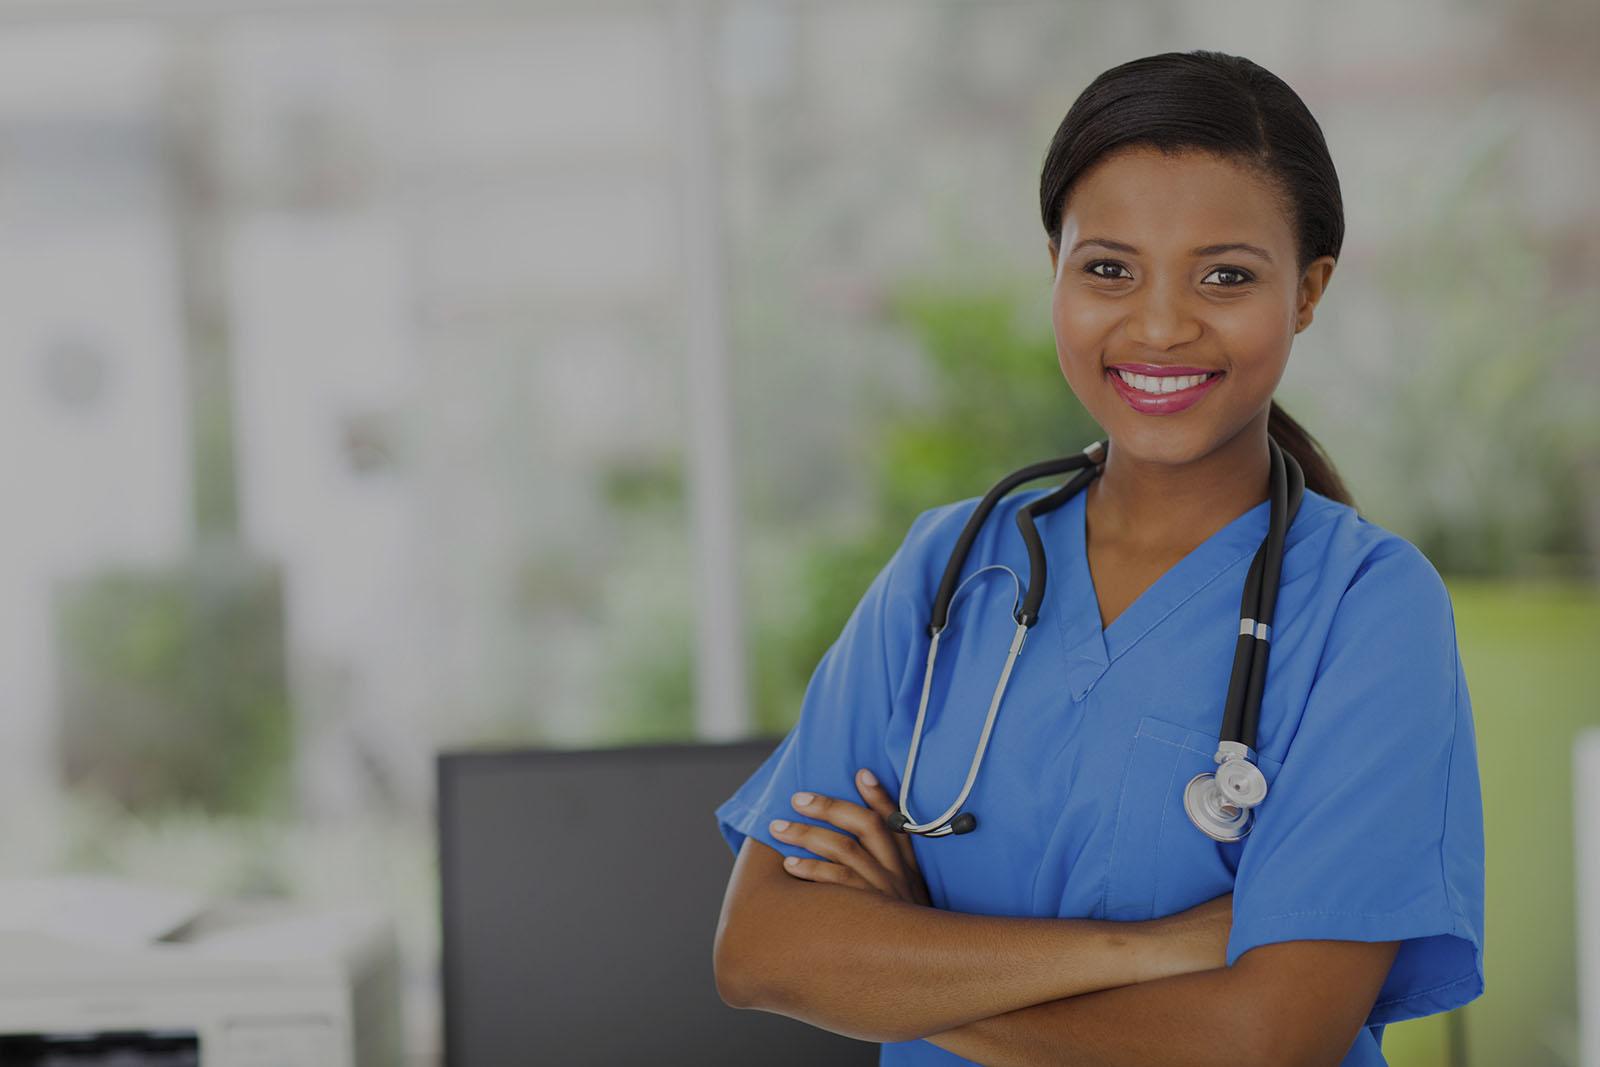 603e127ee29ec Nurse Staffing Find Your Perfect Nursing Position - Traveling Nurse ...